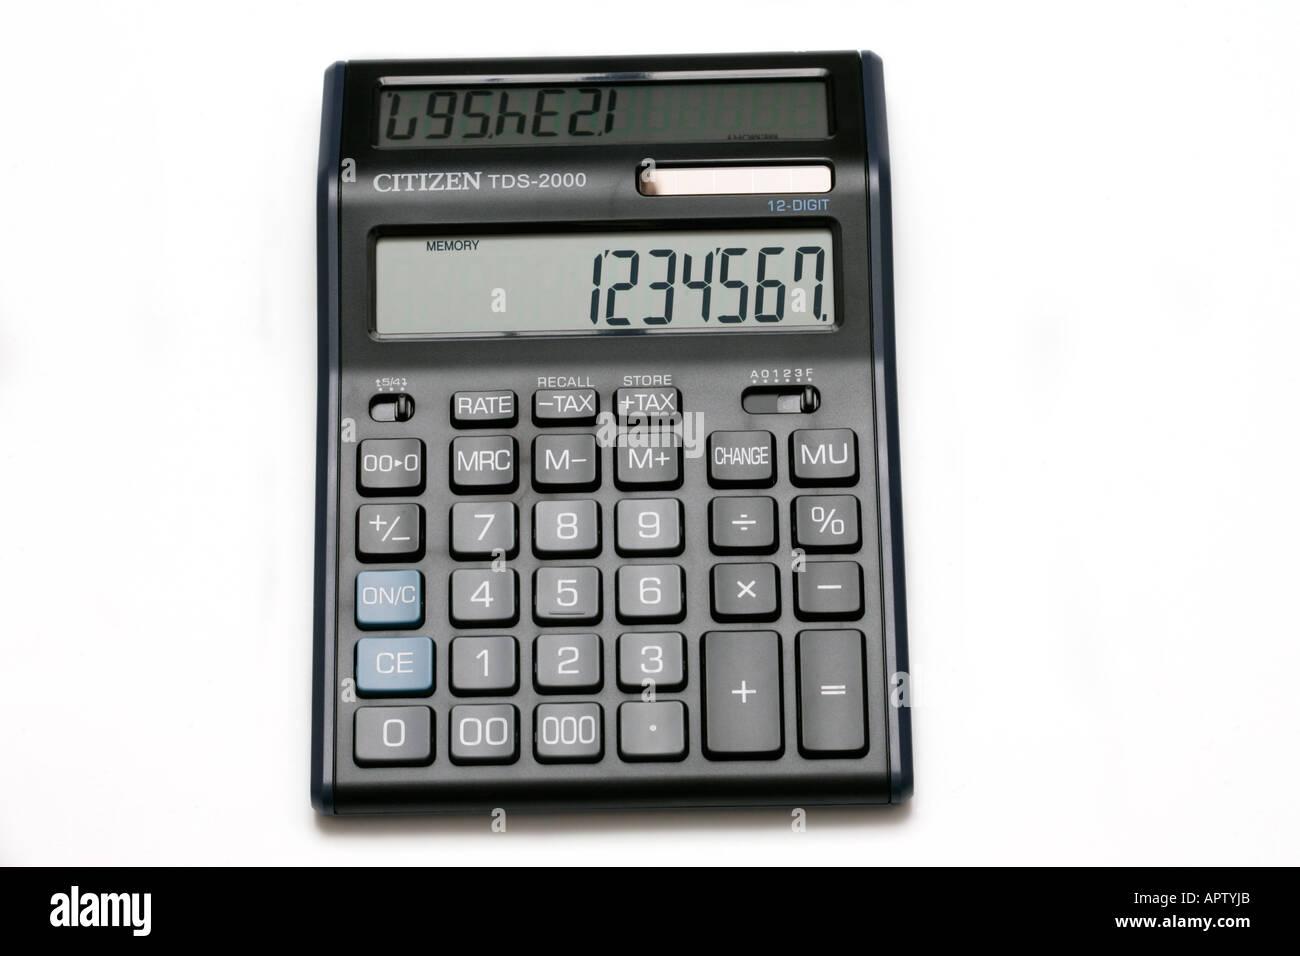 Using a scientific calculator: 3 using your calculator for.